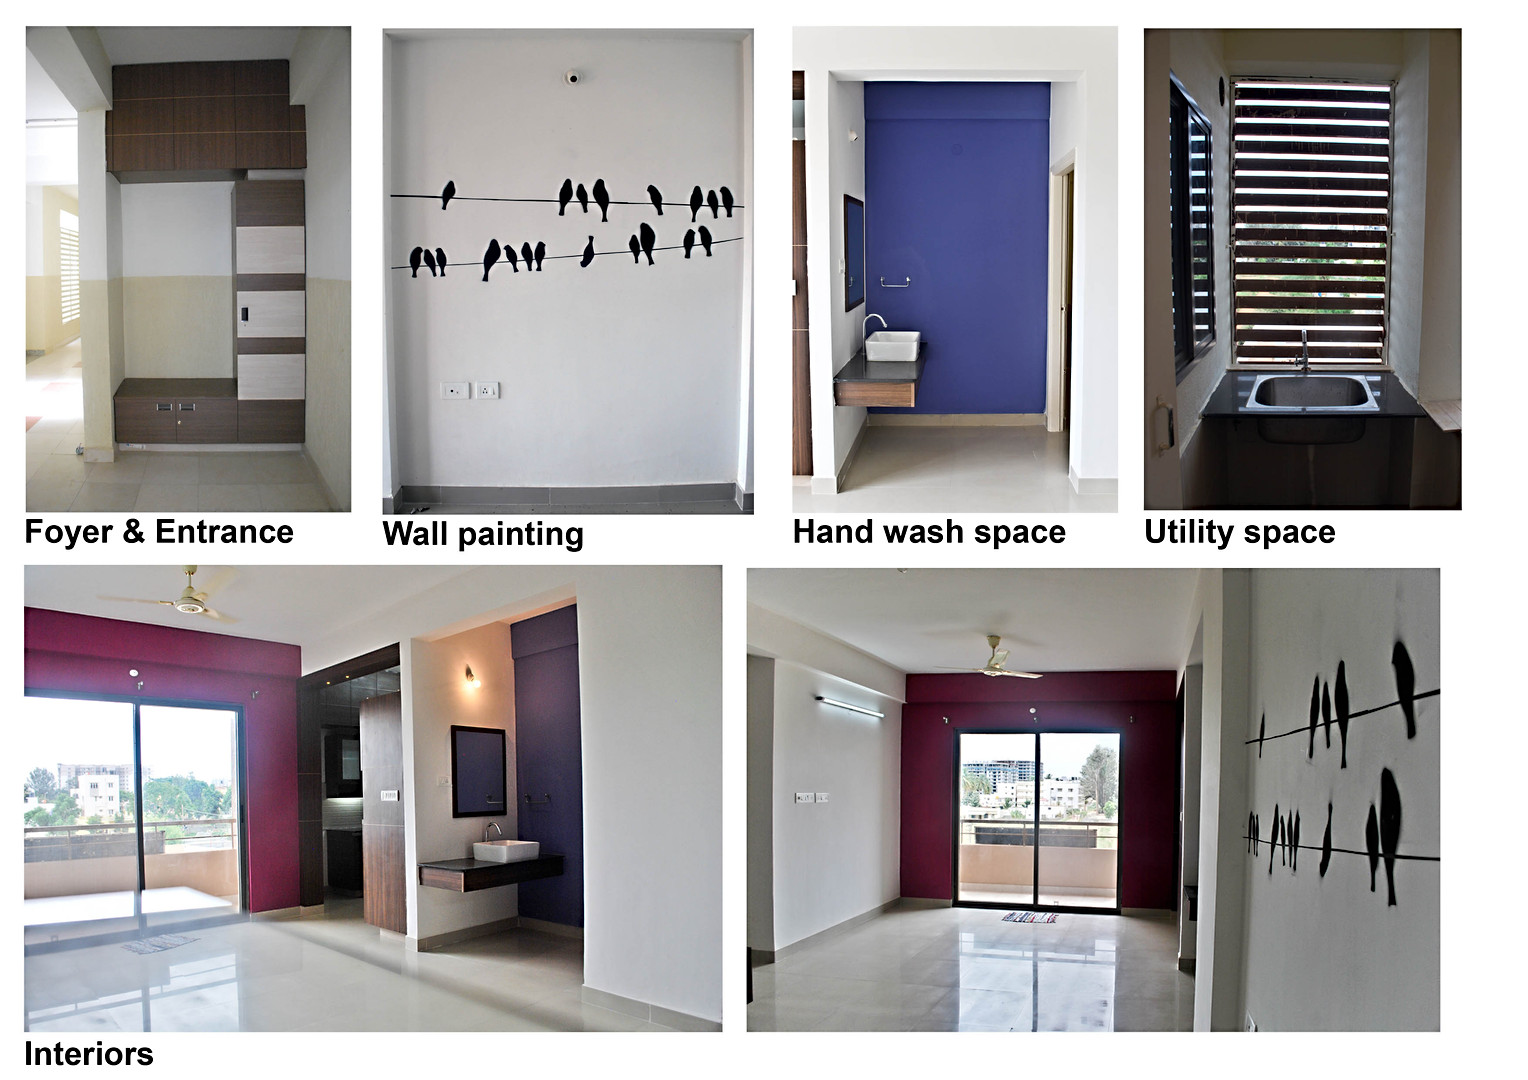 Space Collage Interiors